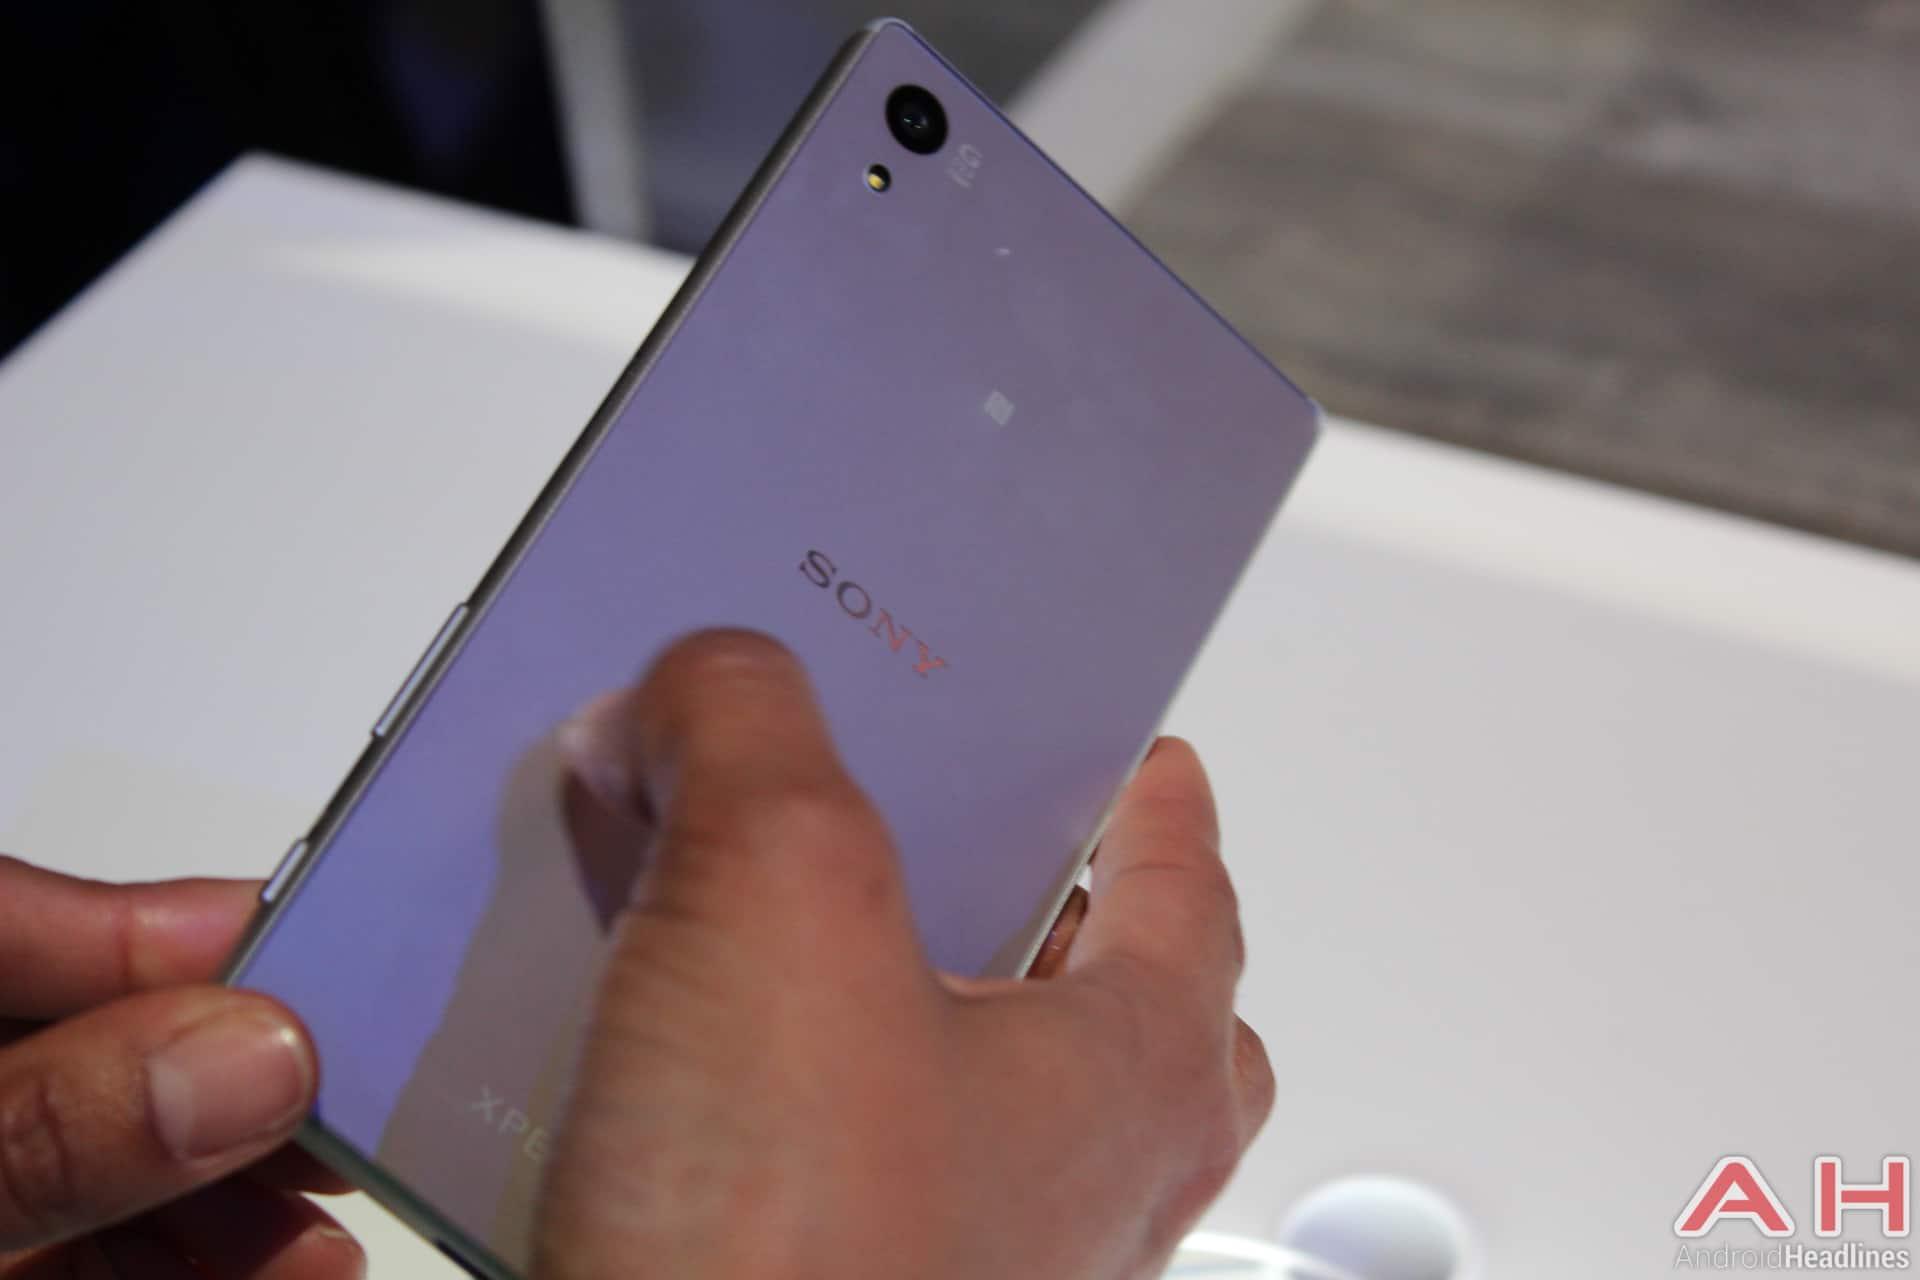 Sony Xperia Z5 IFA AH 5